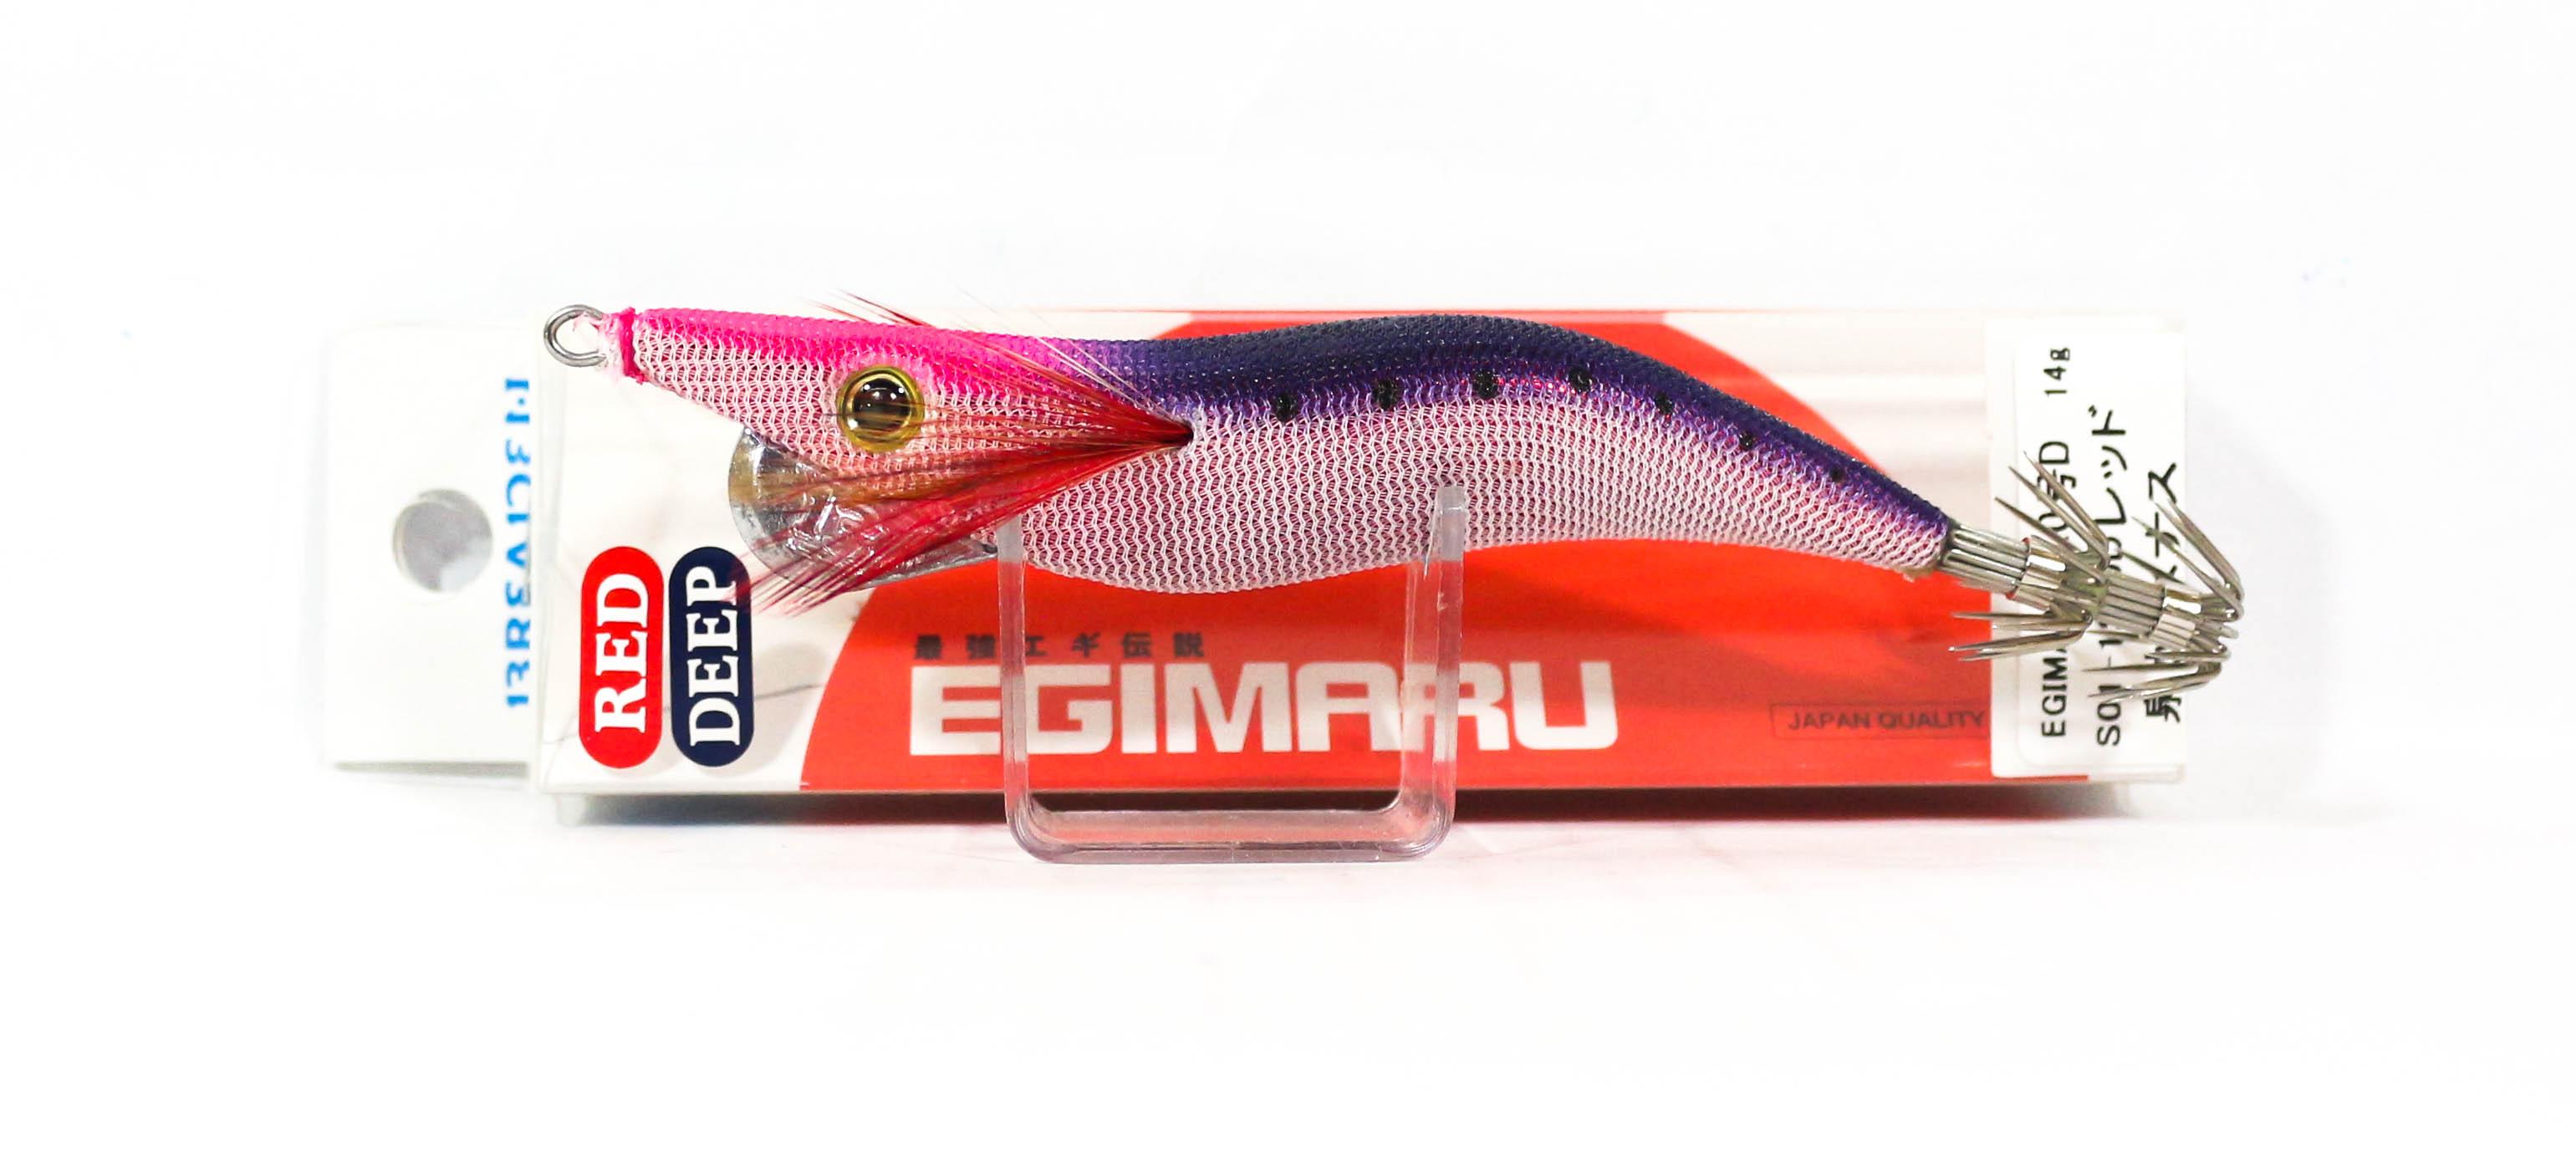 Breaden Egimaru Squid Jig Sinking Lure 3.0D S01-1230D (7494)